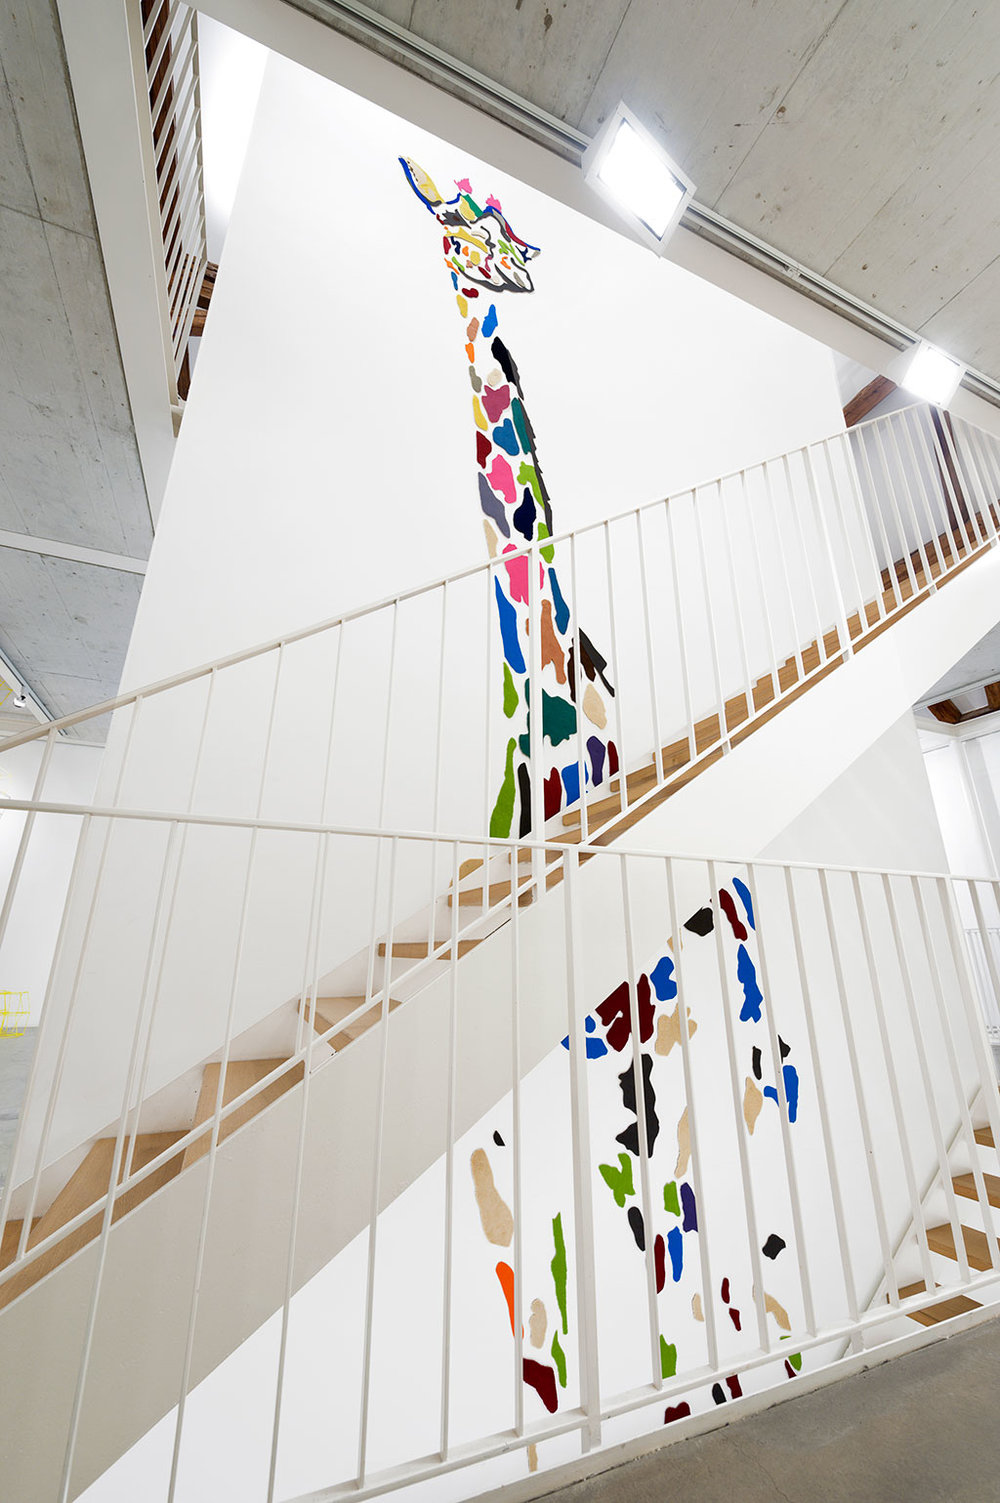 She comes in colours, 2011, Carpet, 890 x 230 cm